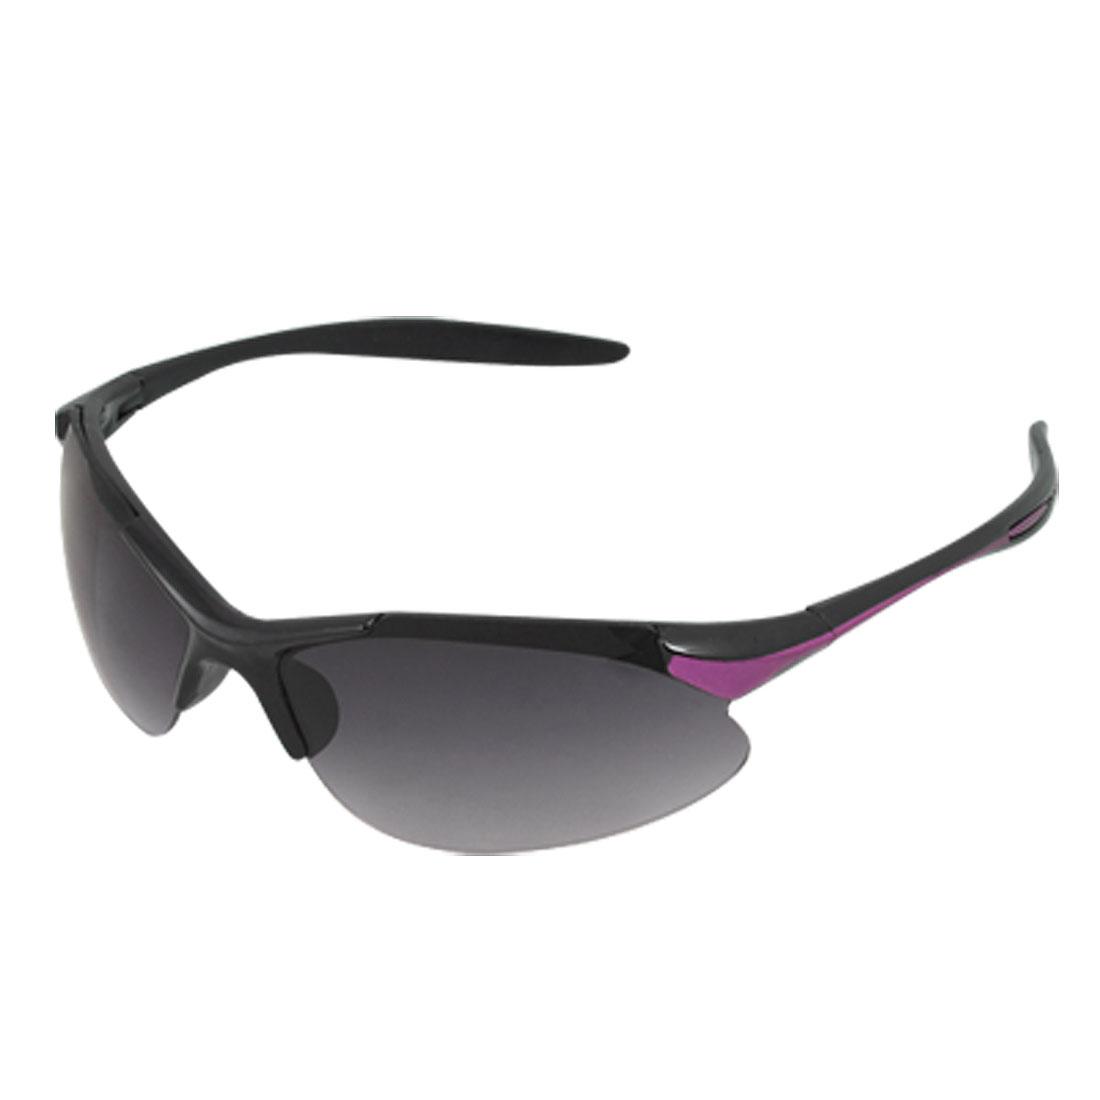 Unisex Purple Accent Black Plastic Arms Smoke Lens Sports Sunglasses